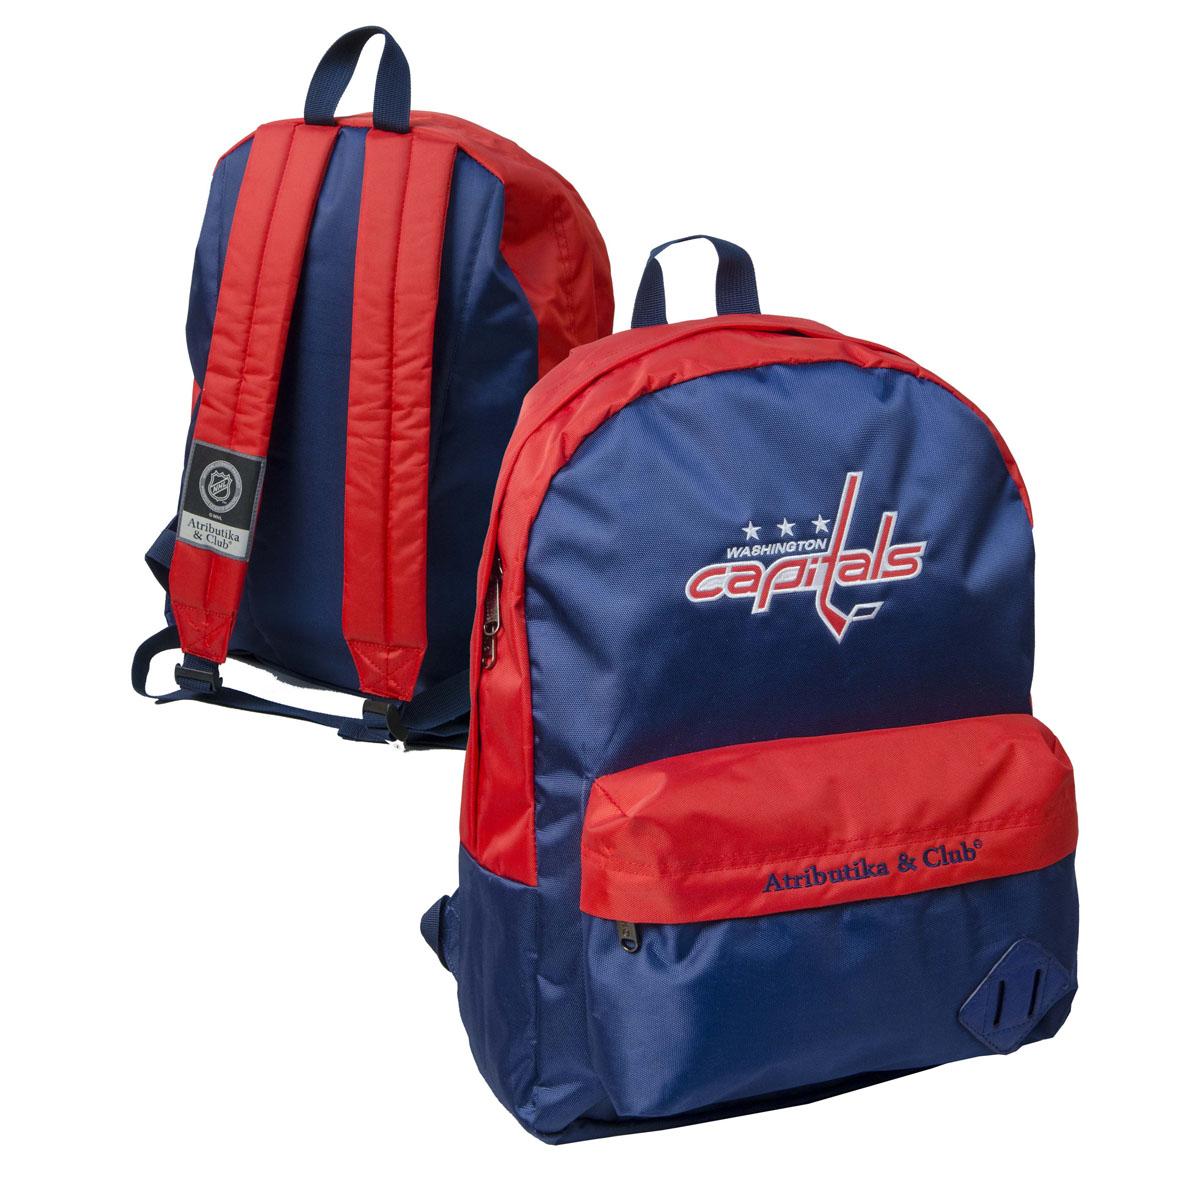 Рюкзак спортивный NHL Washington Capitals, цвет: красно-синий, 18 л. 58042 ( 58042 )